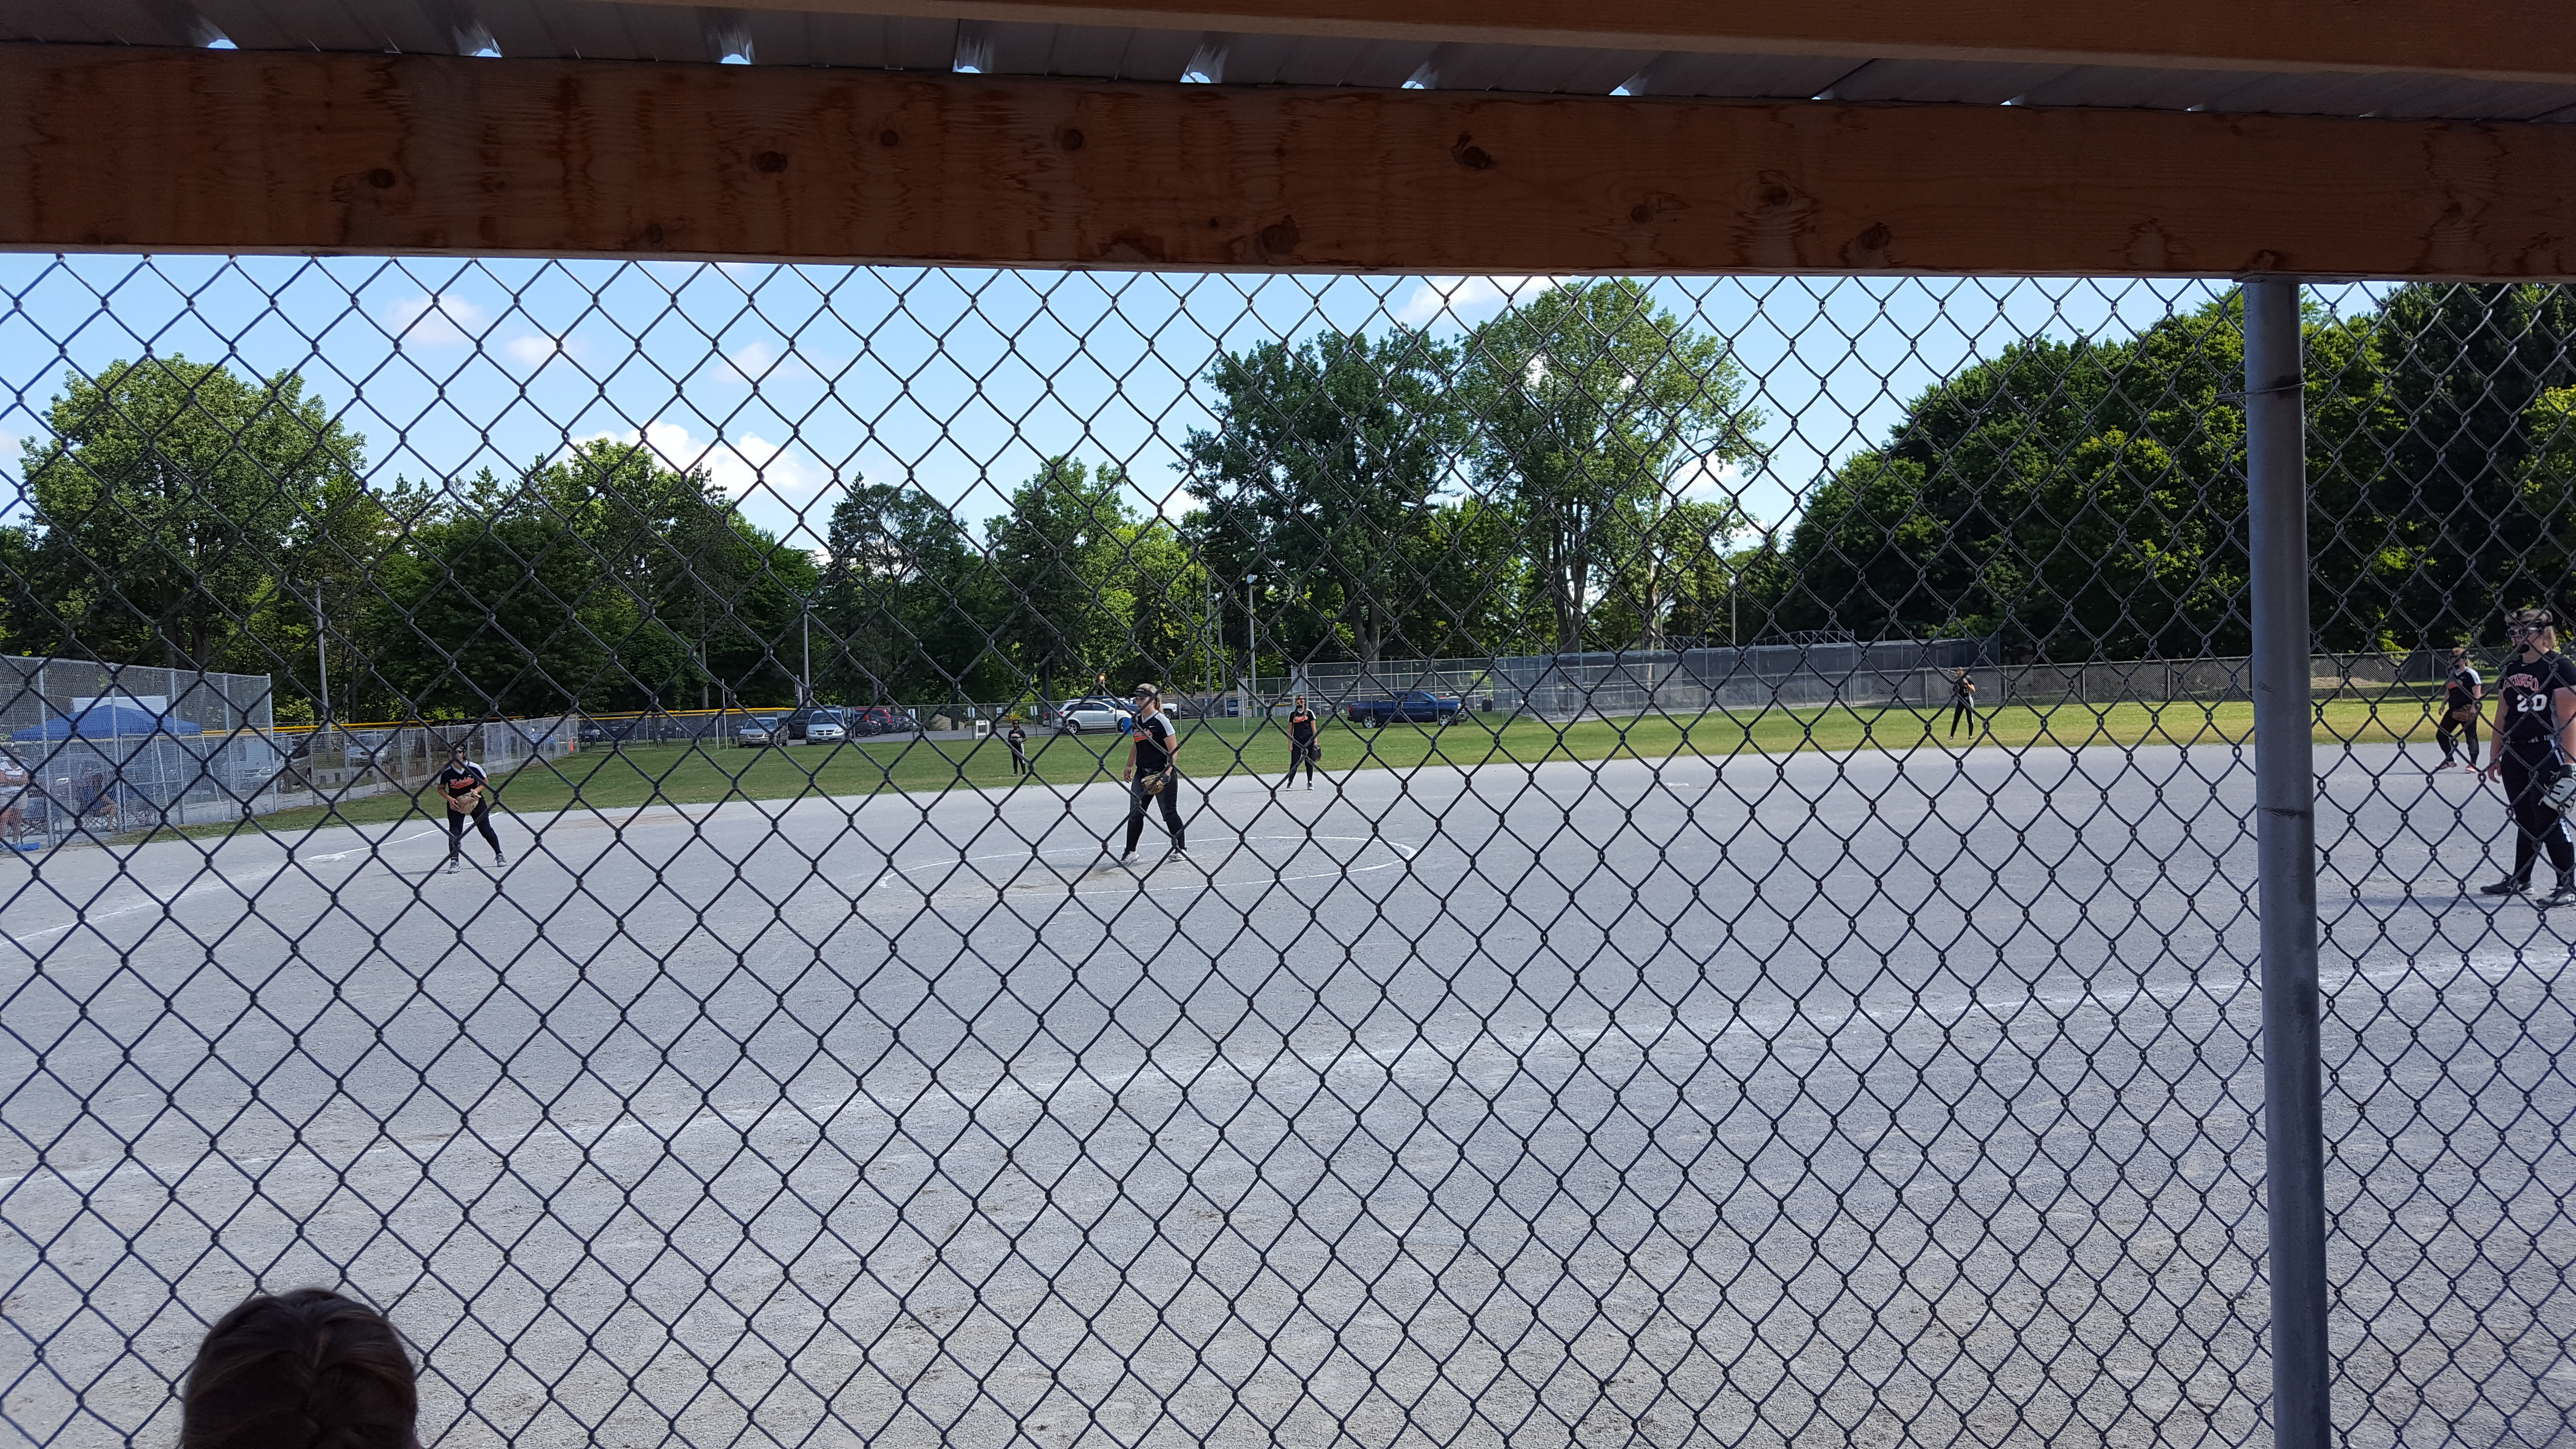 Softball Tournament in Swanton July, 2016 (15)